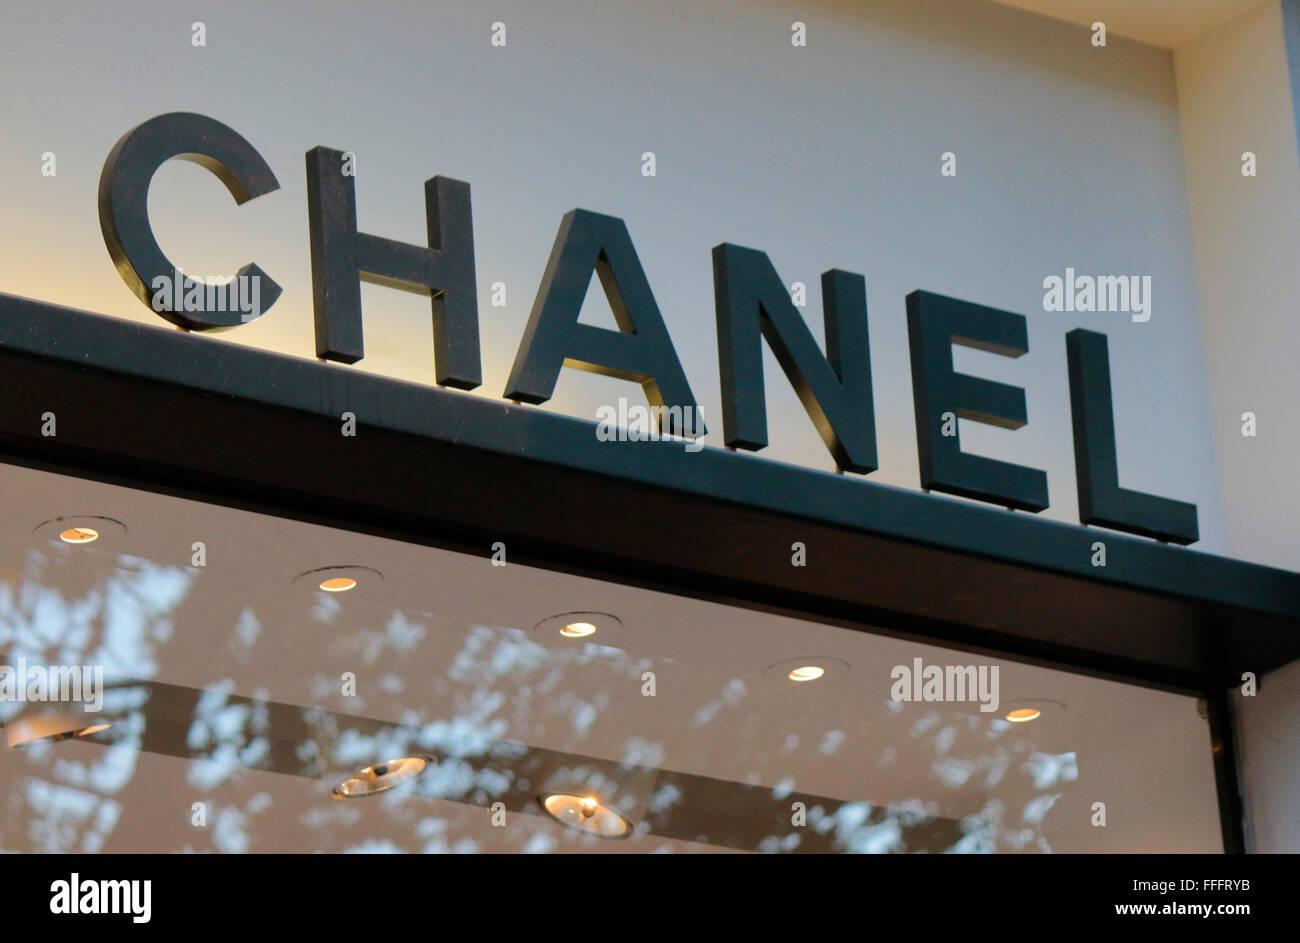 Chanel Berlin chanel logo stock photos chanel logo stock images alamy